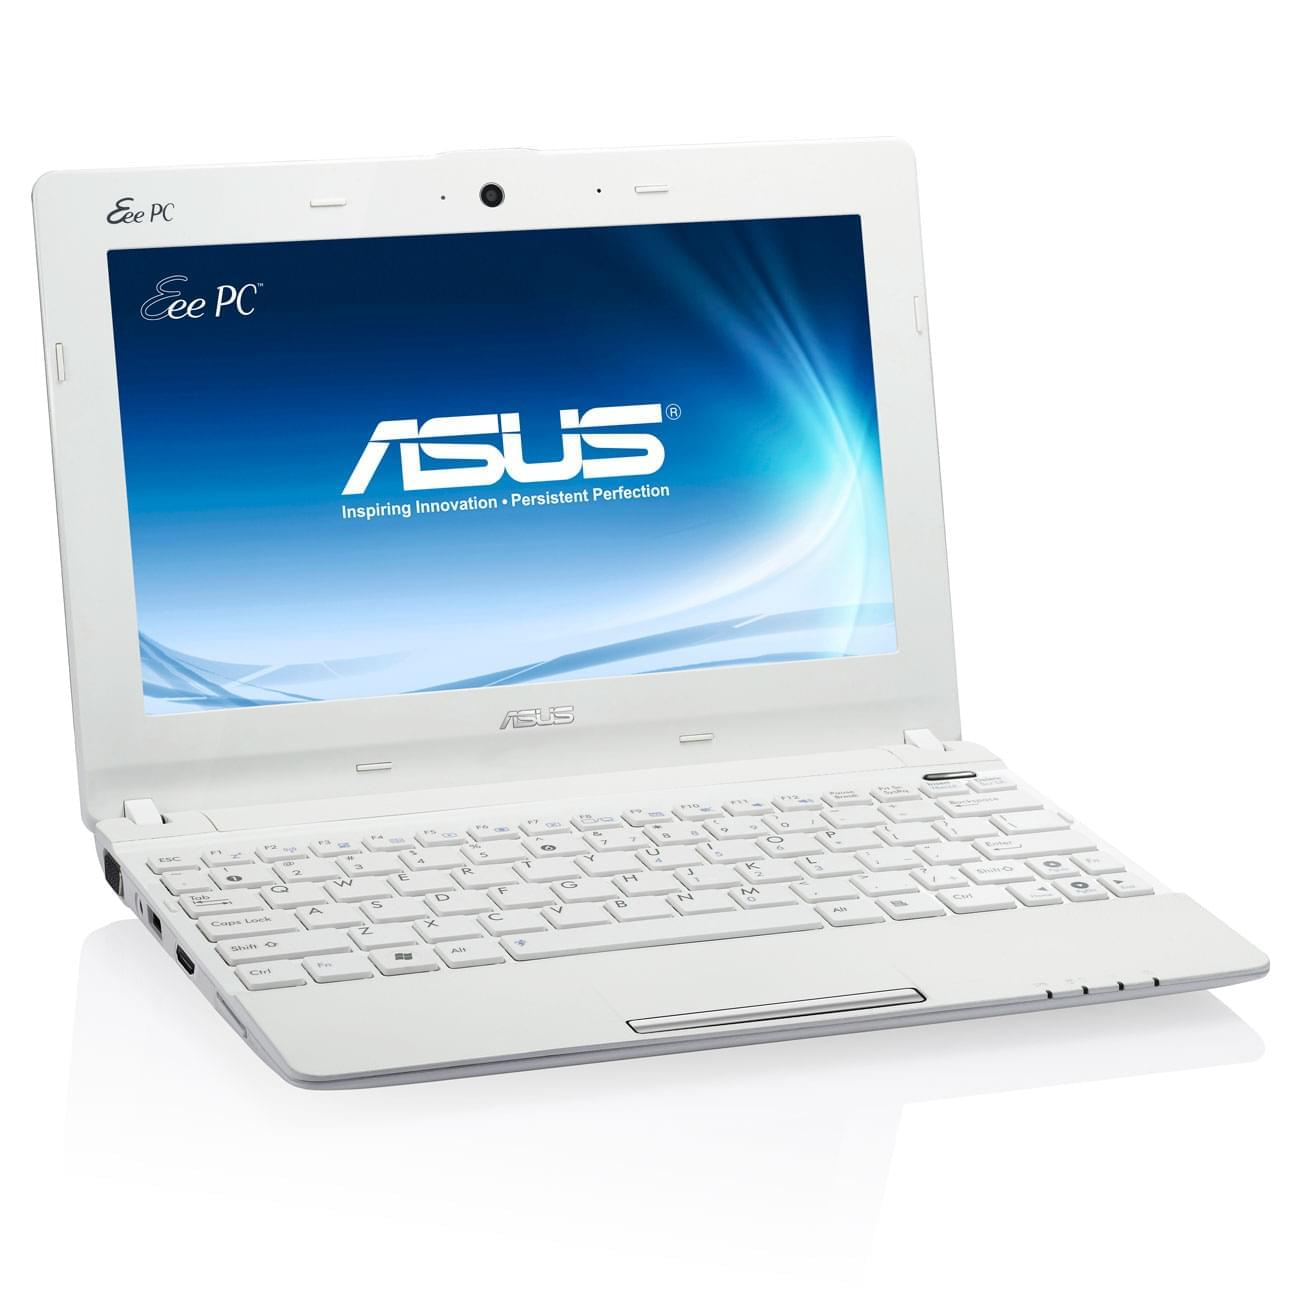 Asus X101CH-WHI024S (X101CH-WHI024S) - Achat / Vente PC Portable sur Cybertek.fr - 0